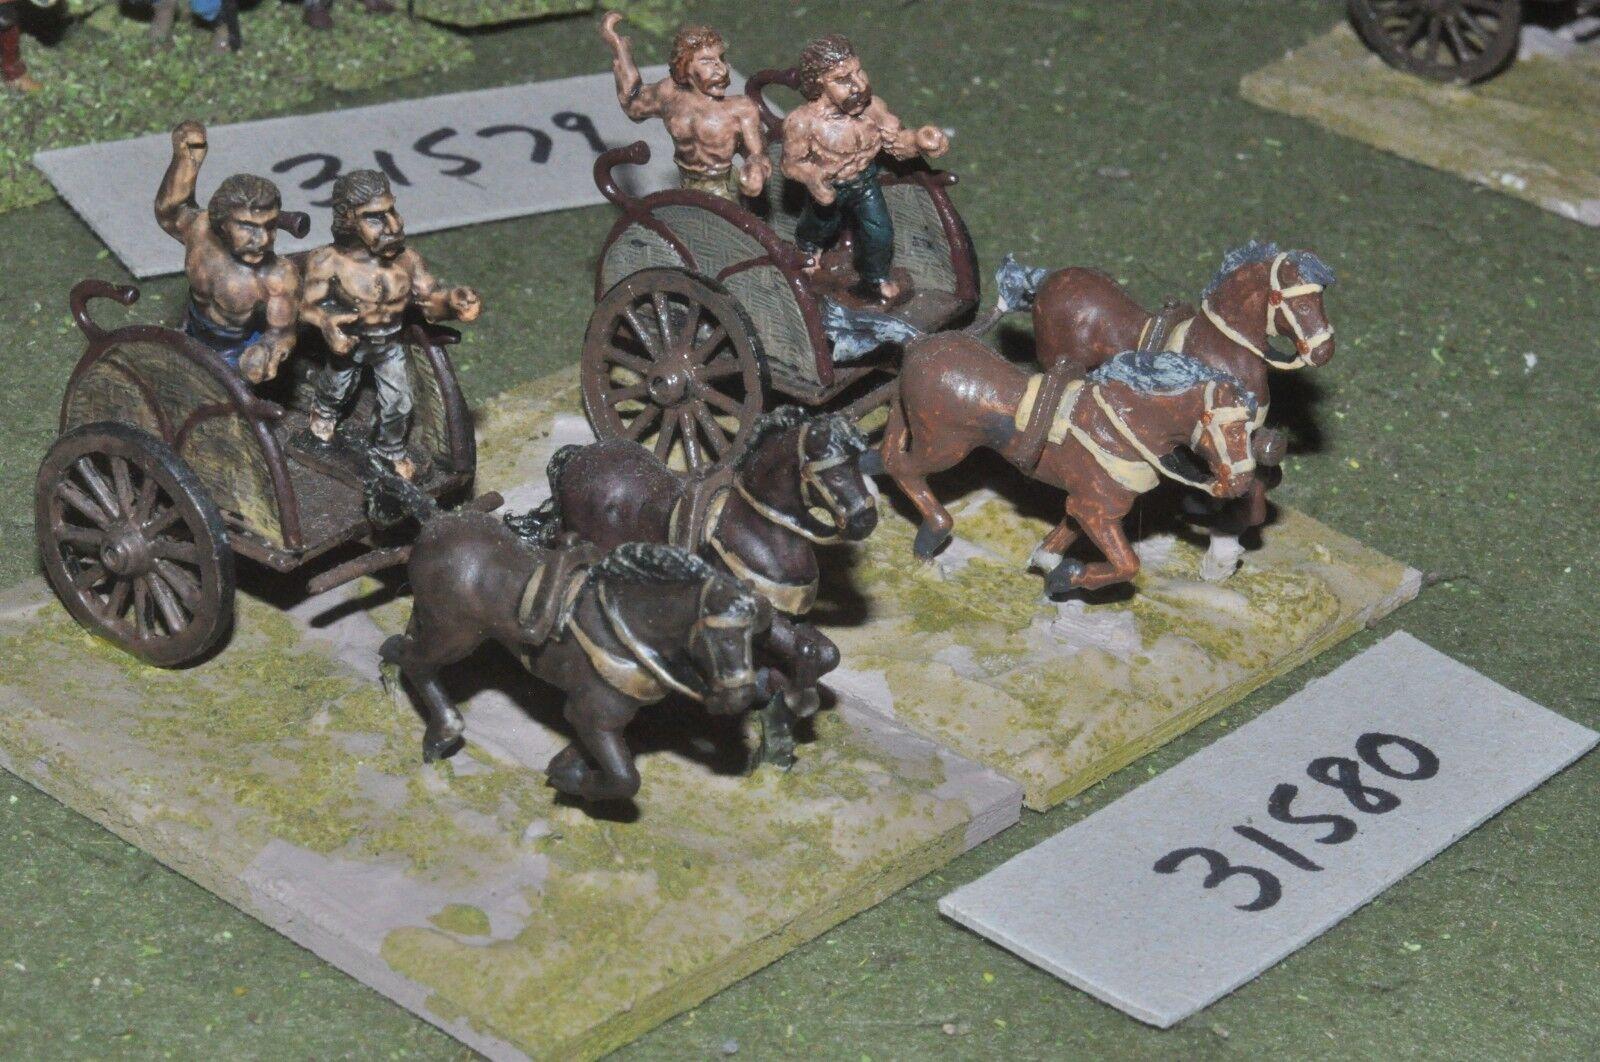 25mm roman era   gaul - 2 light - chariot (31580)